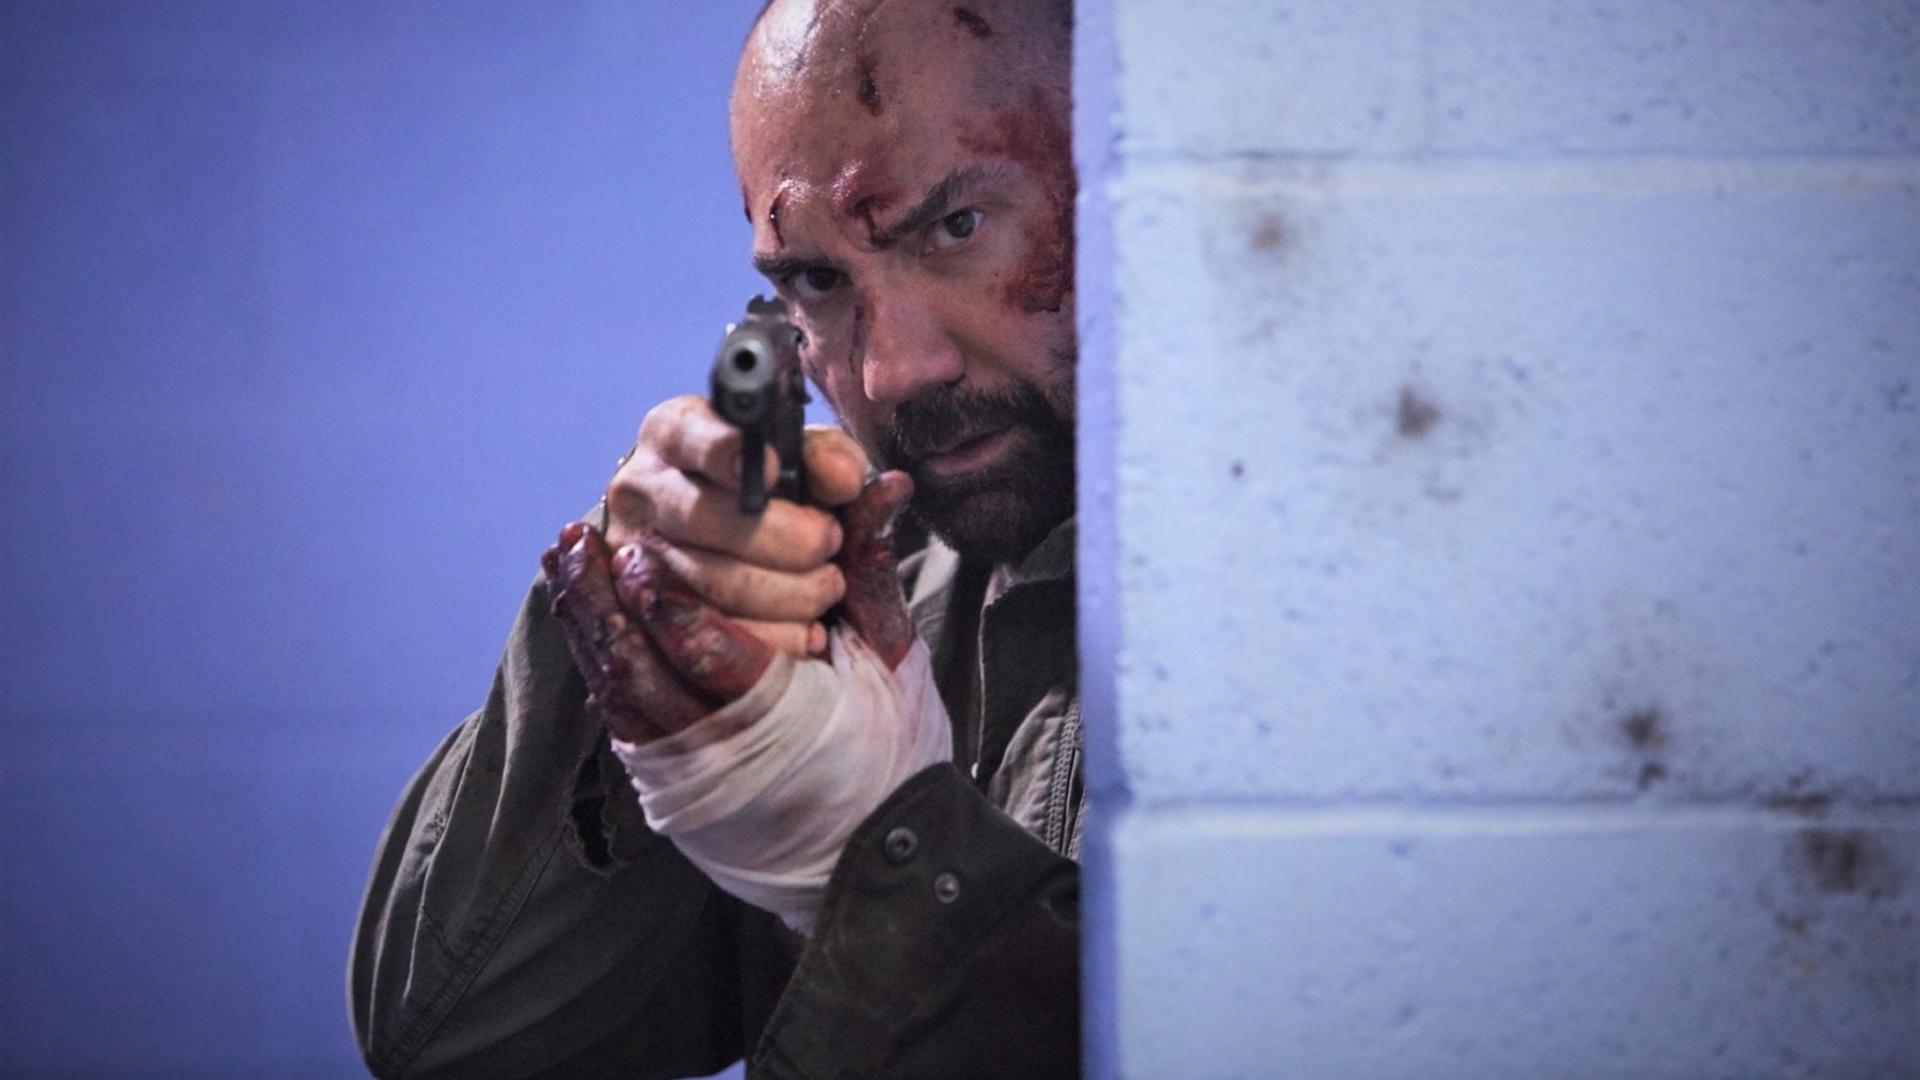 My Spy | David Bautista estrela nova comédia